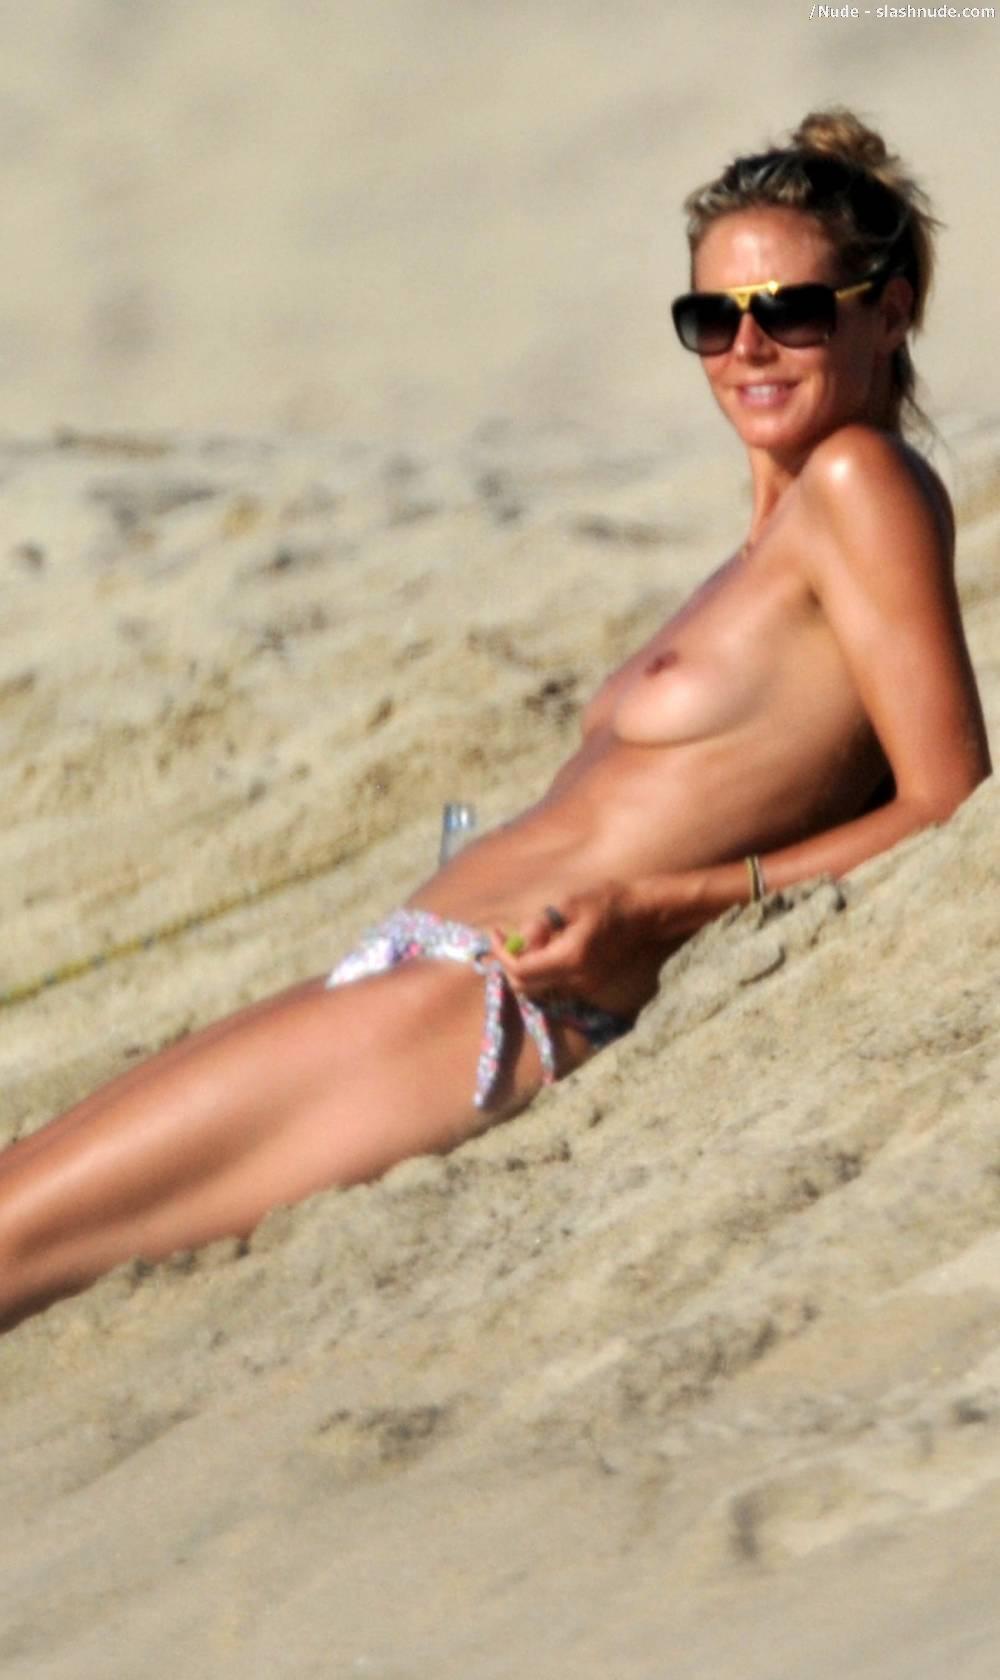 from Messiah hiedi klum nude beach